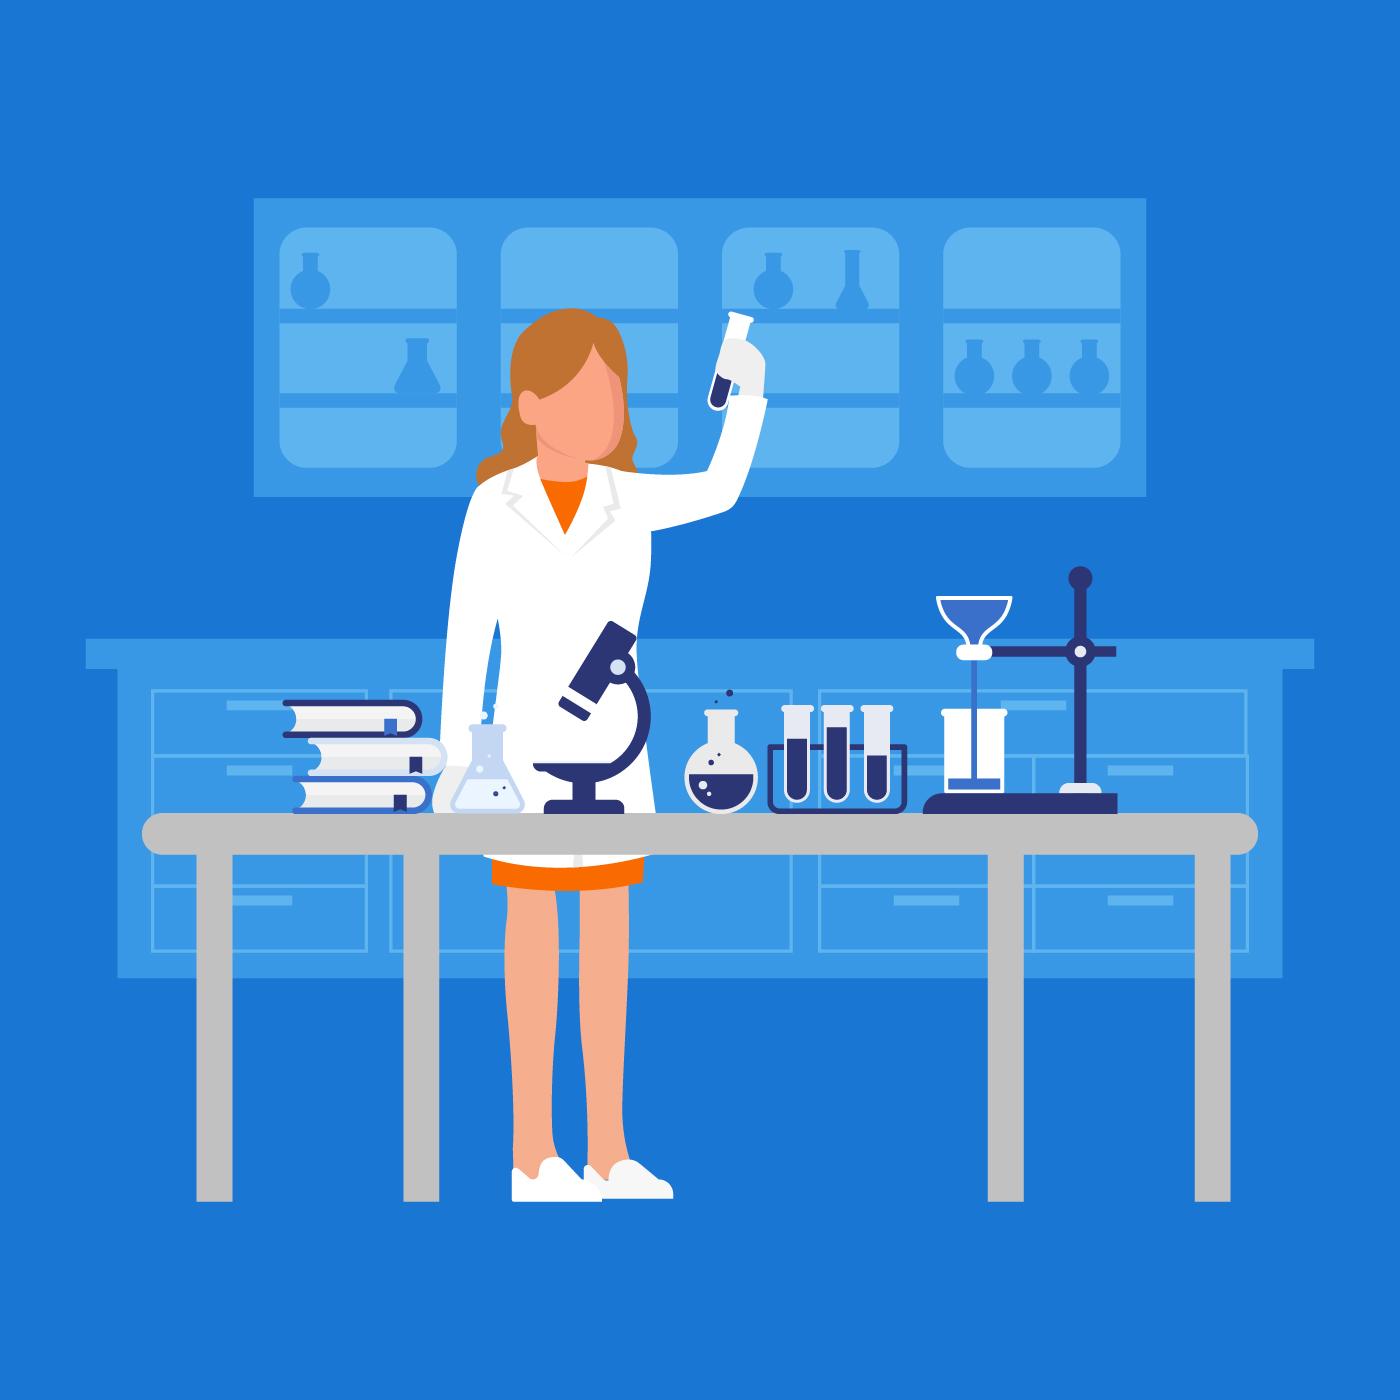 female scientist vector illustration download free vectors clipart graphics vector art https www vecteezy com vector art 229496 female scientist vector illustration